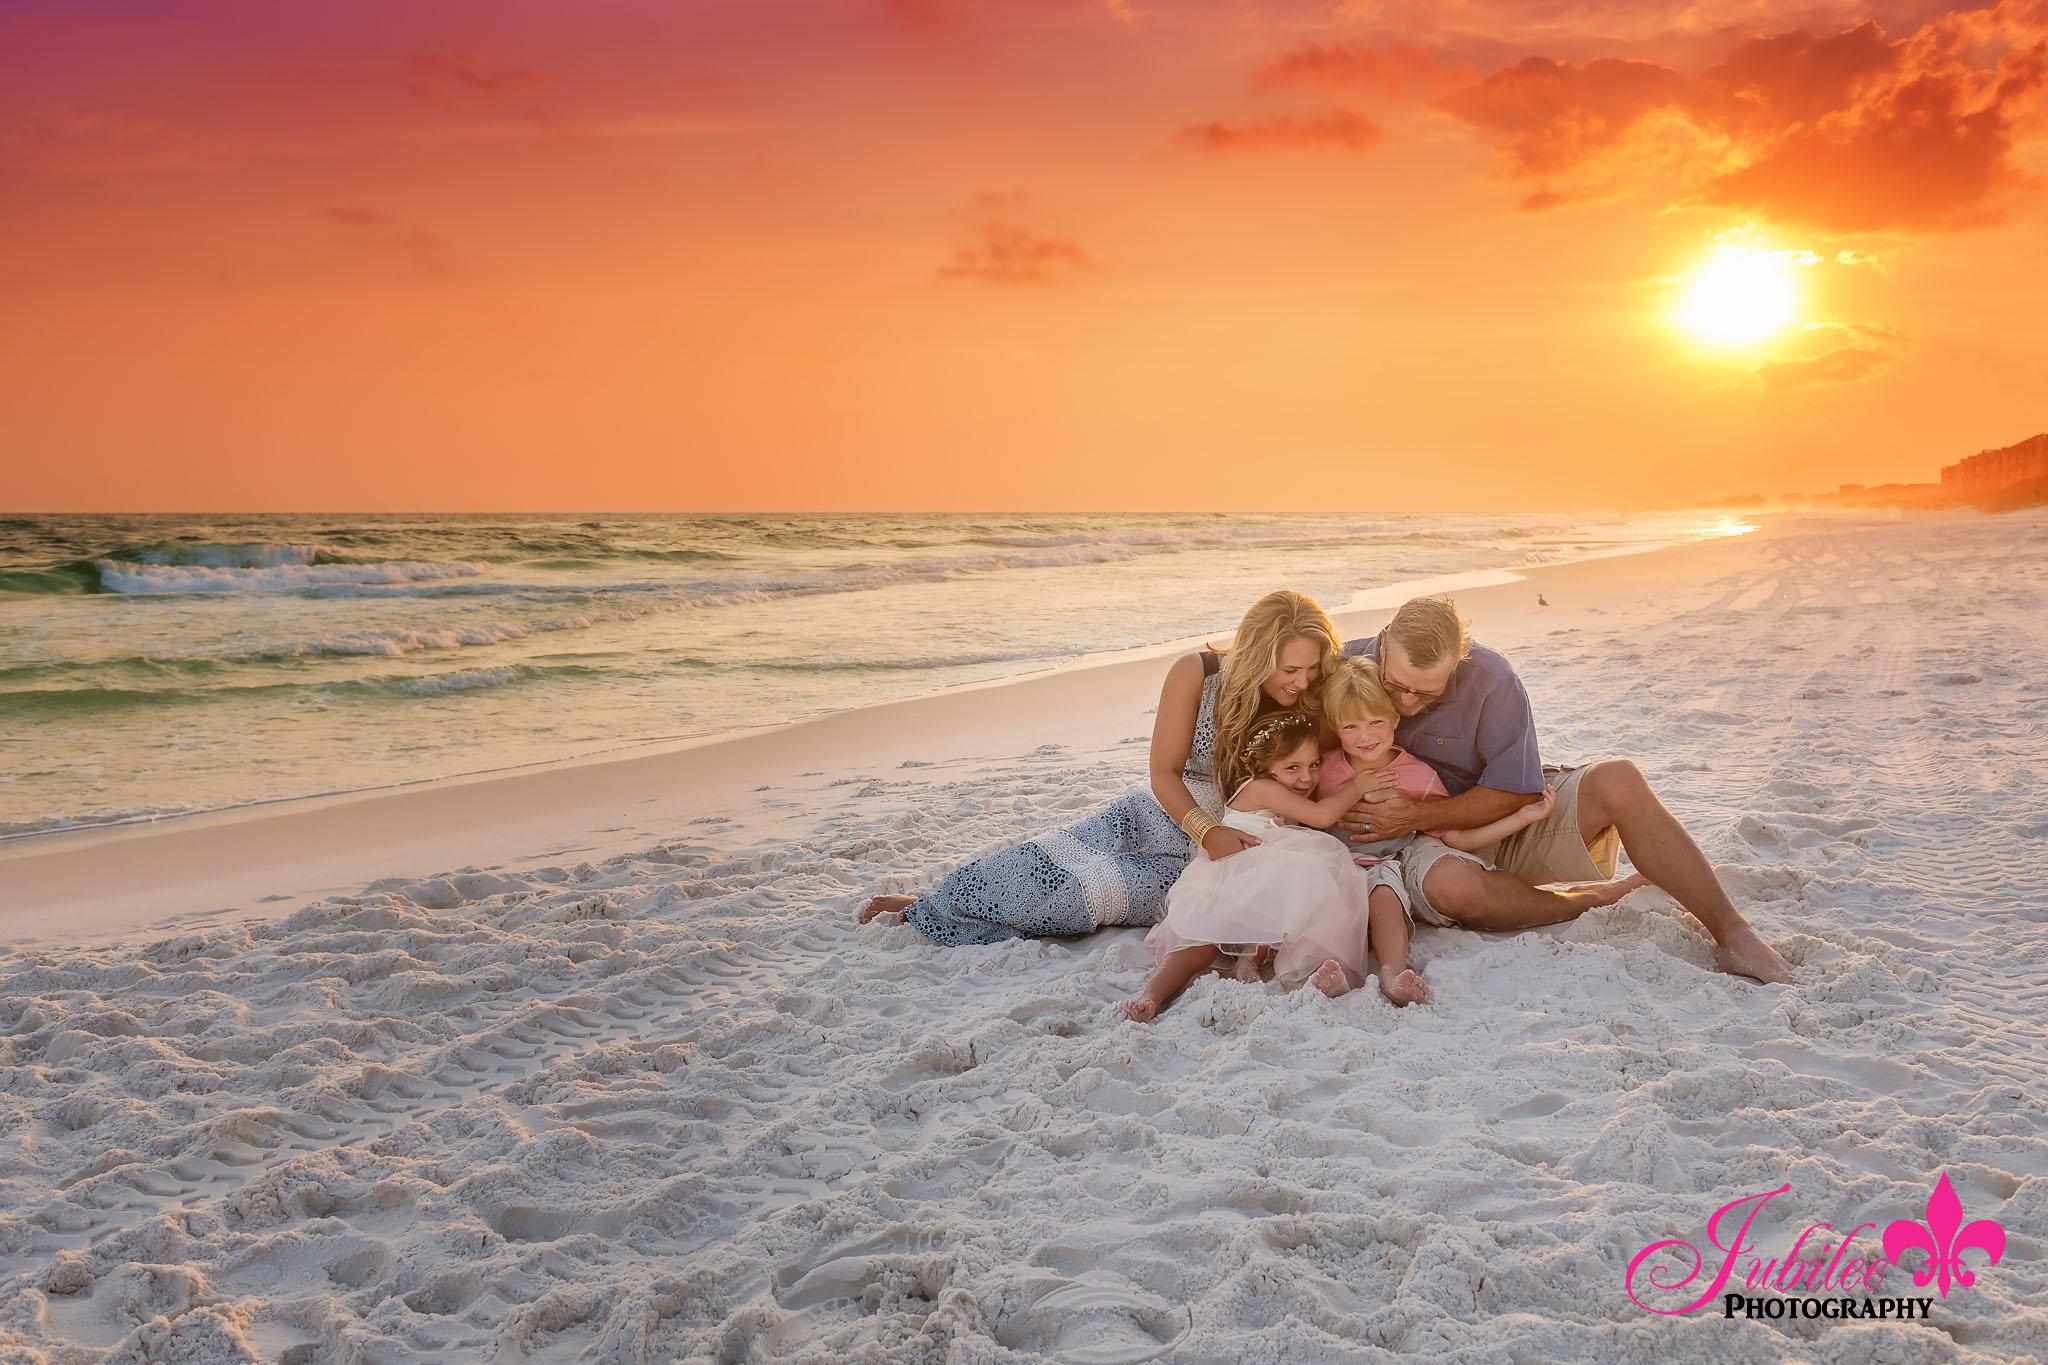 destin_beach_photographer_6192